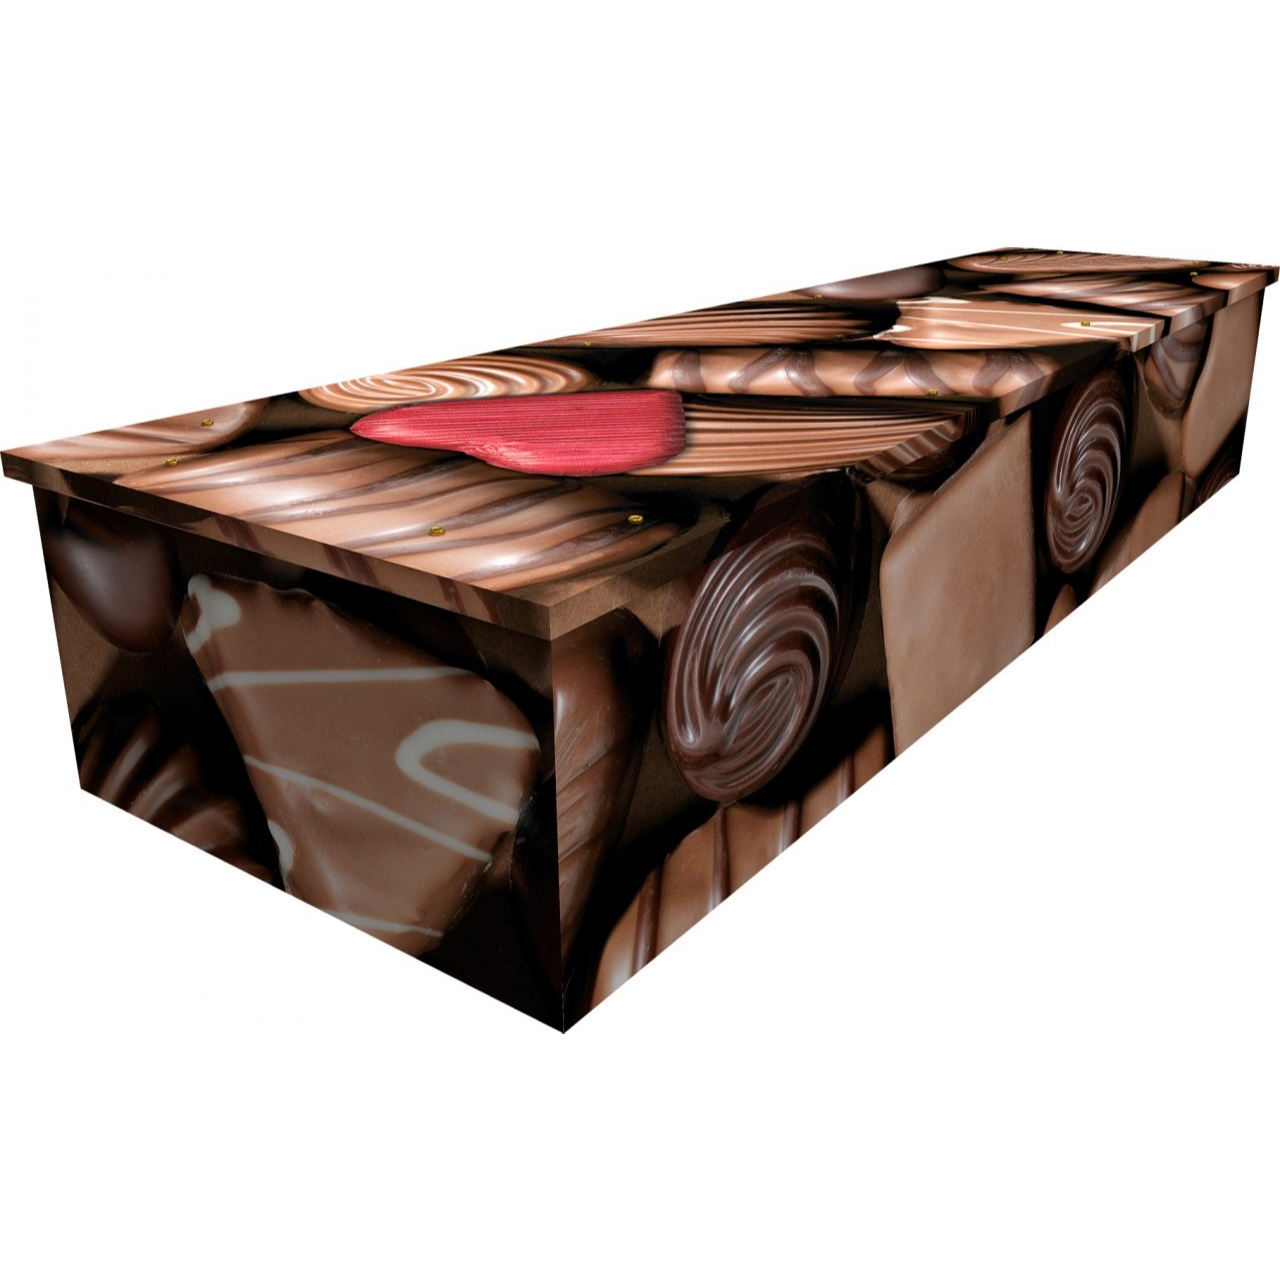 Chocolates Cardboard Coffin